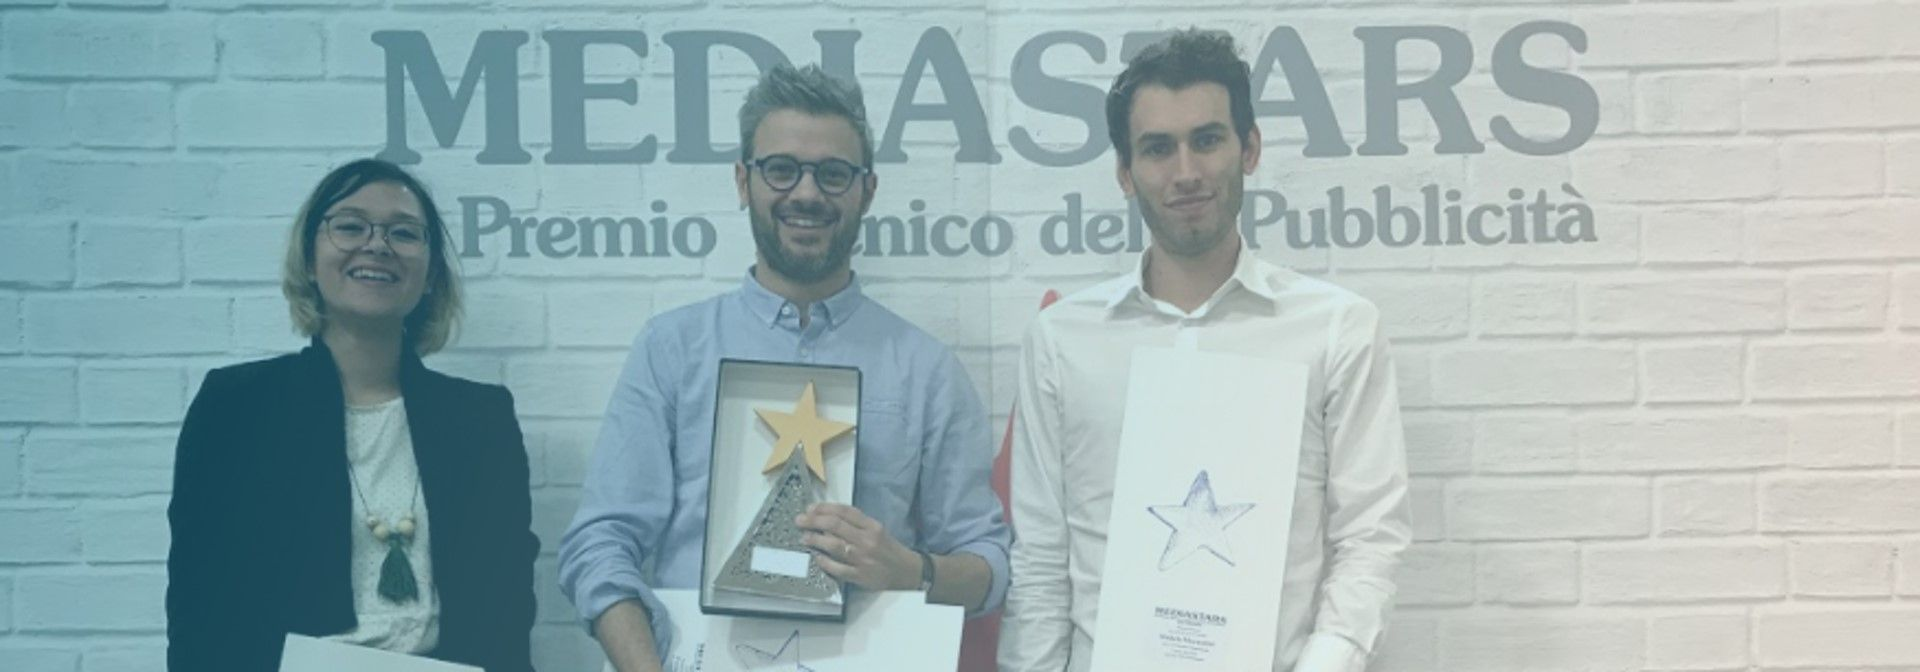 Webperformance, premio Mediastar